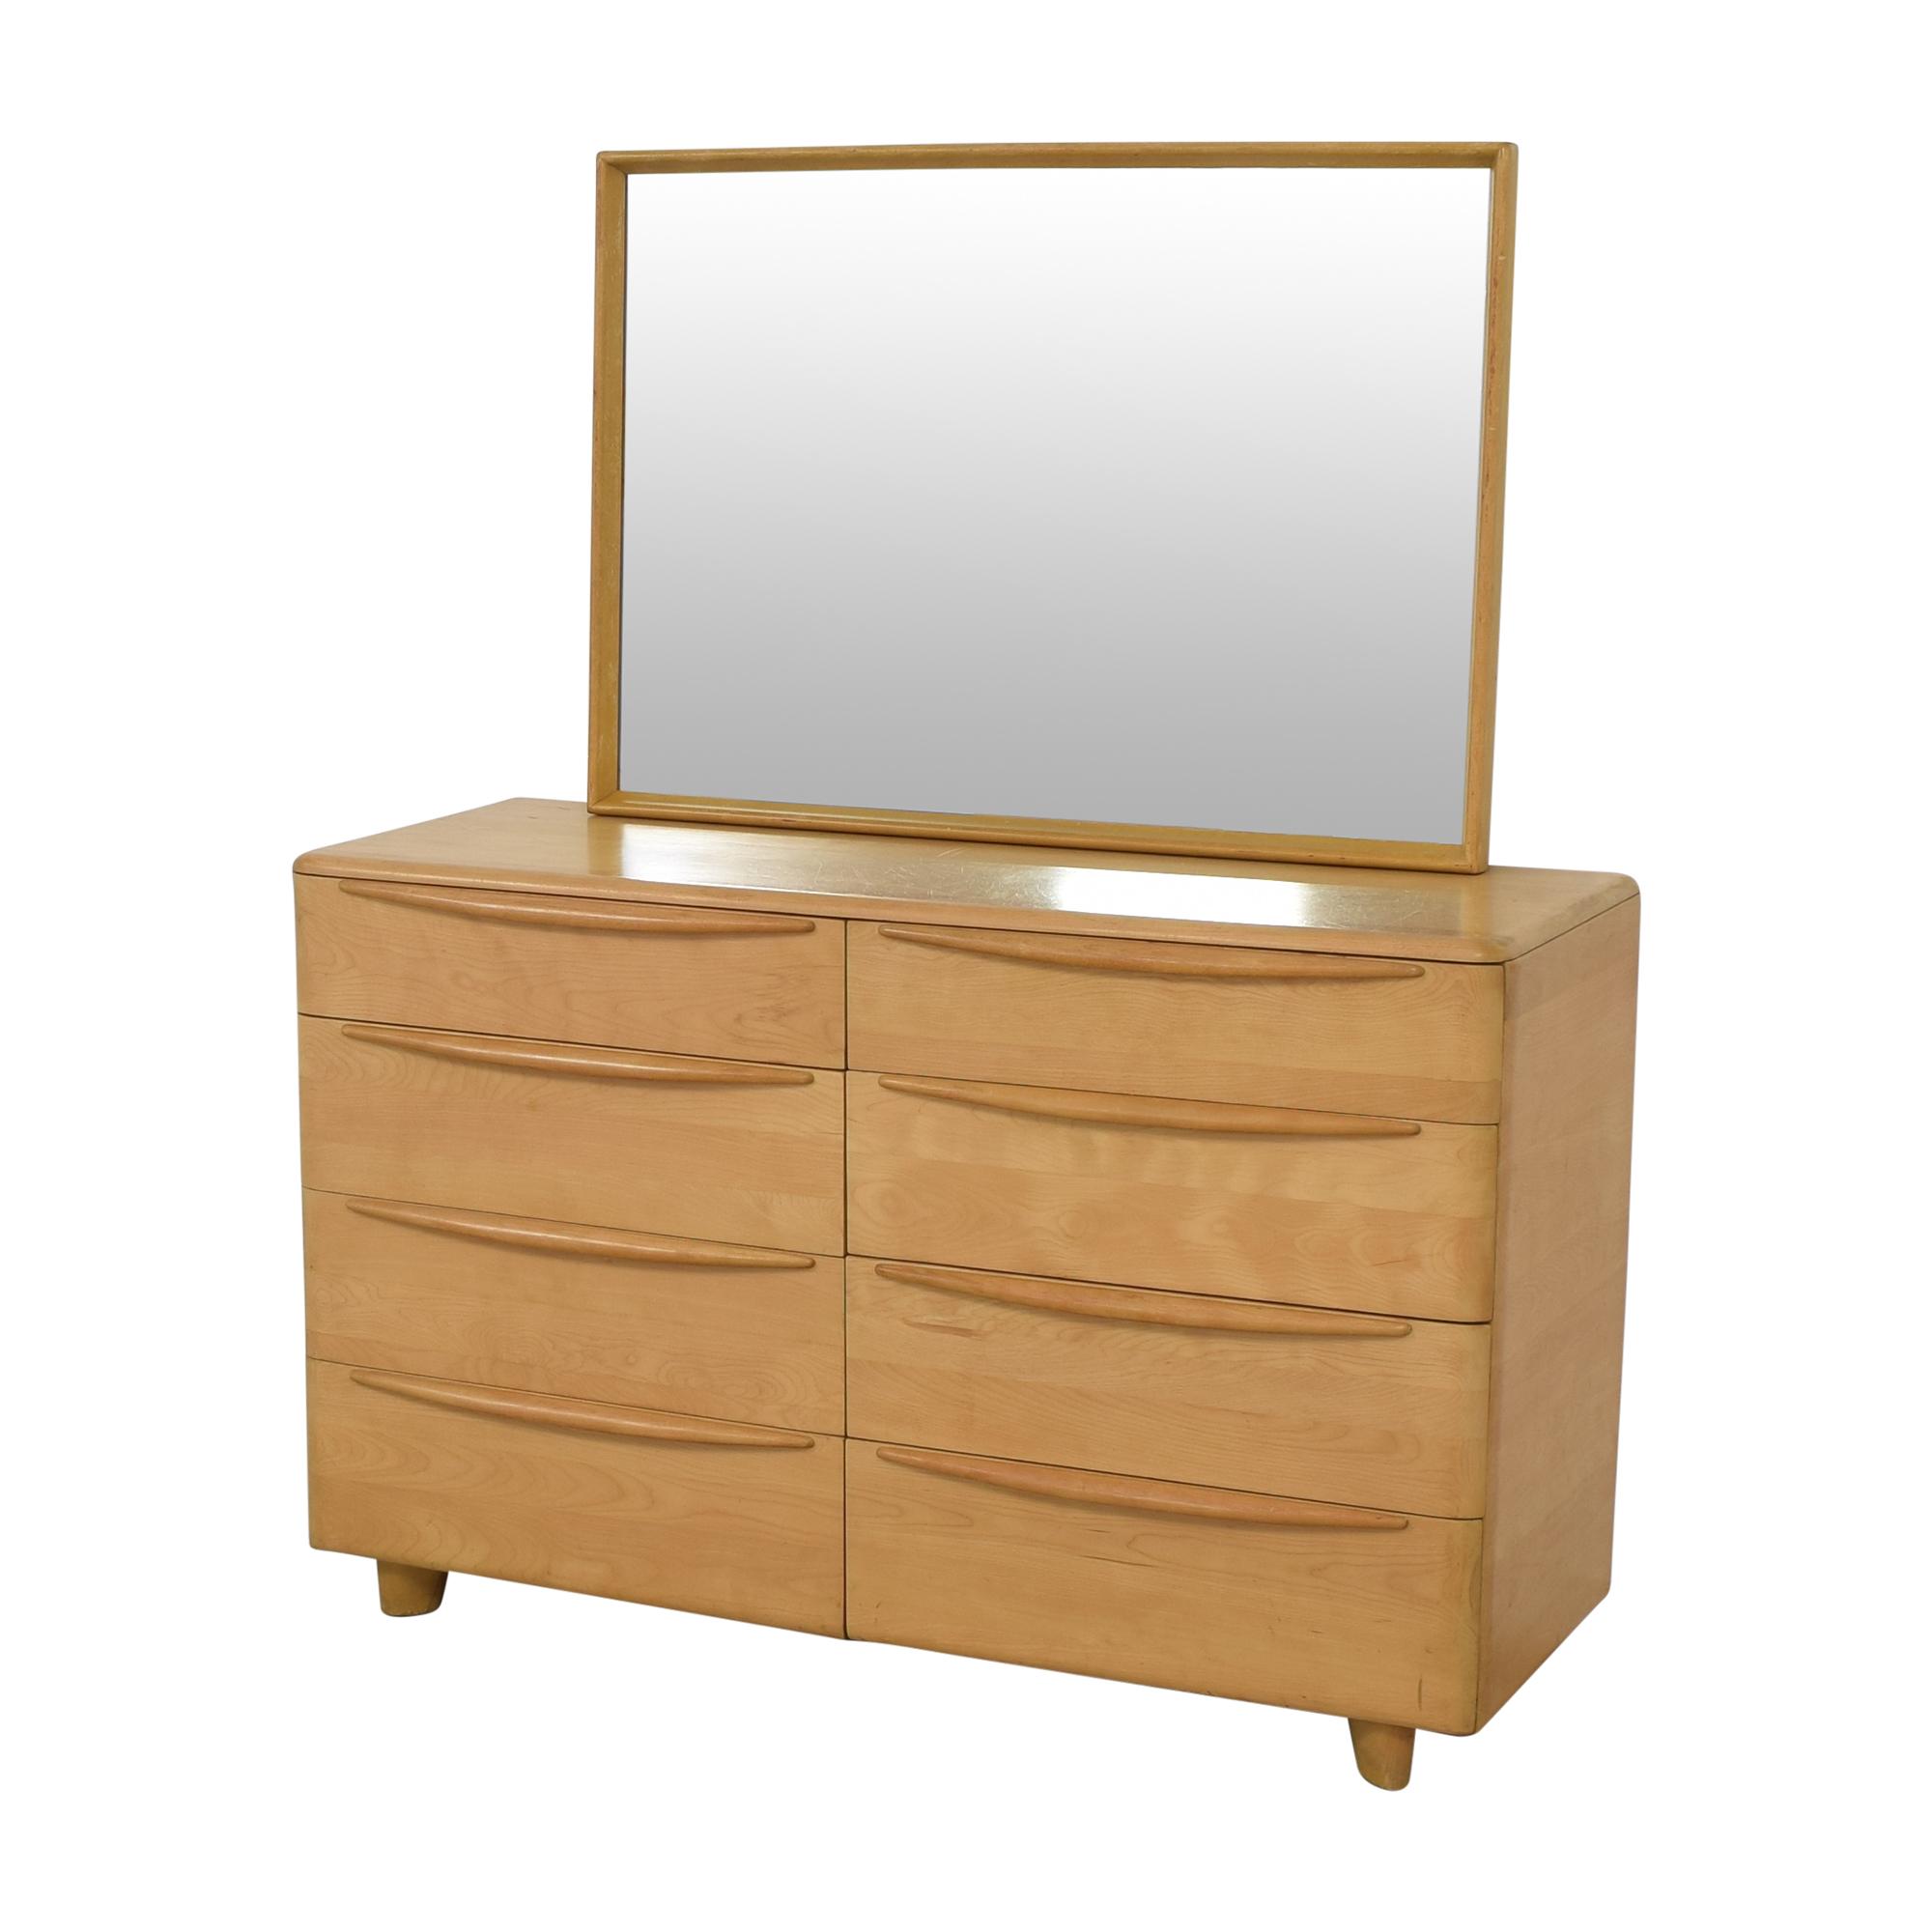 shop Heywood-Wakefield Heywood-Wakefield Encore Eight Drawer Dresser with Mirror online